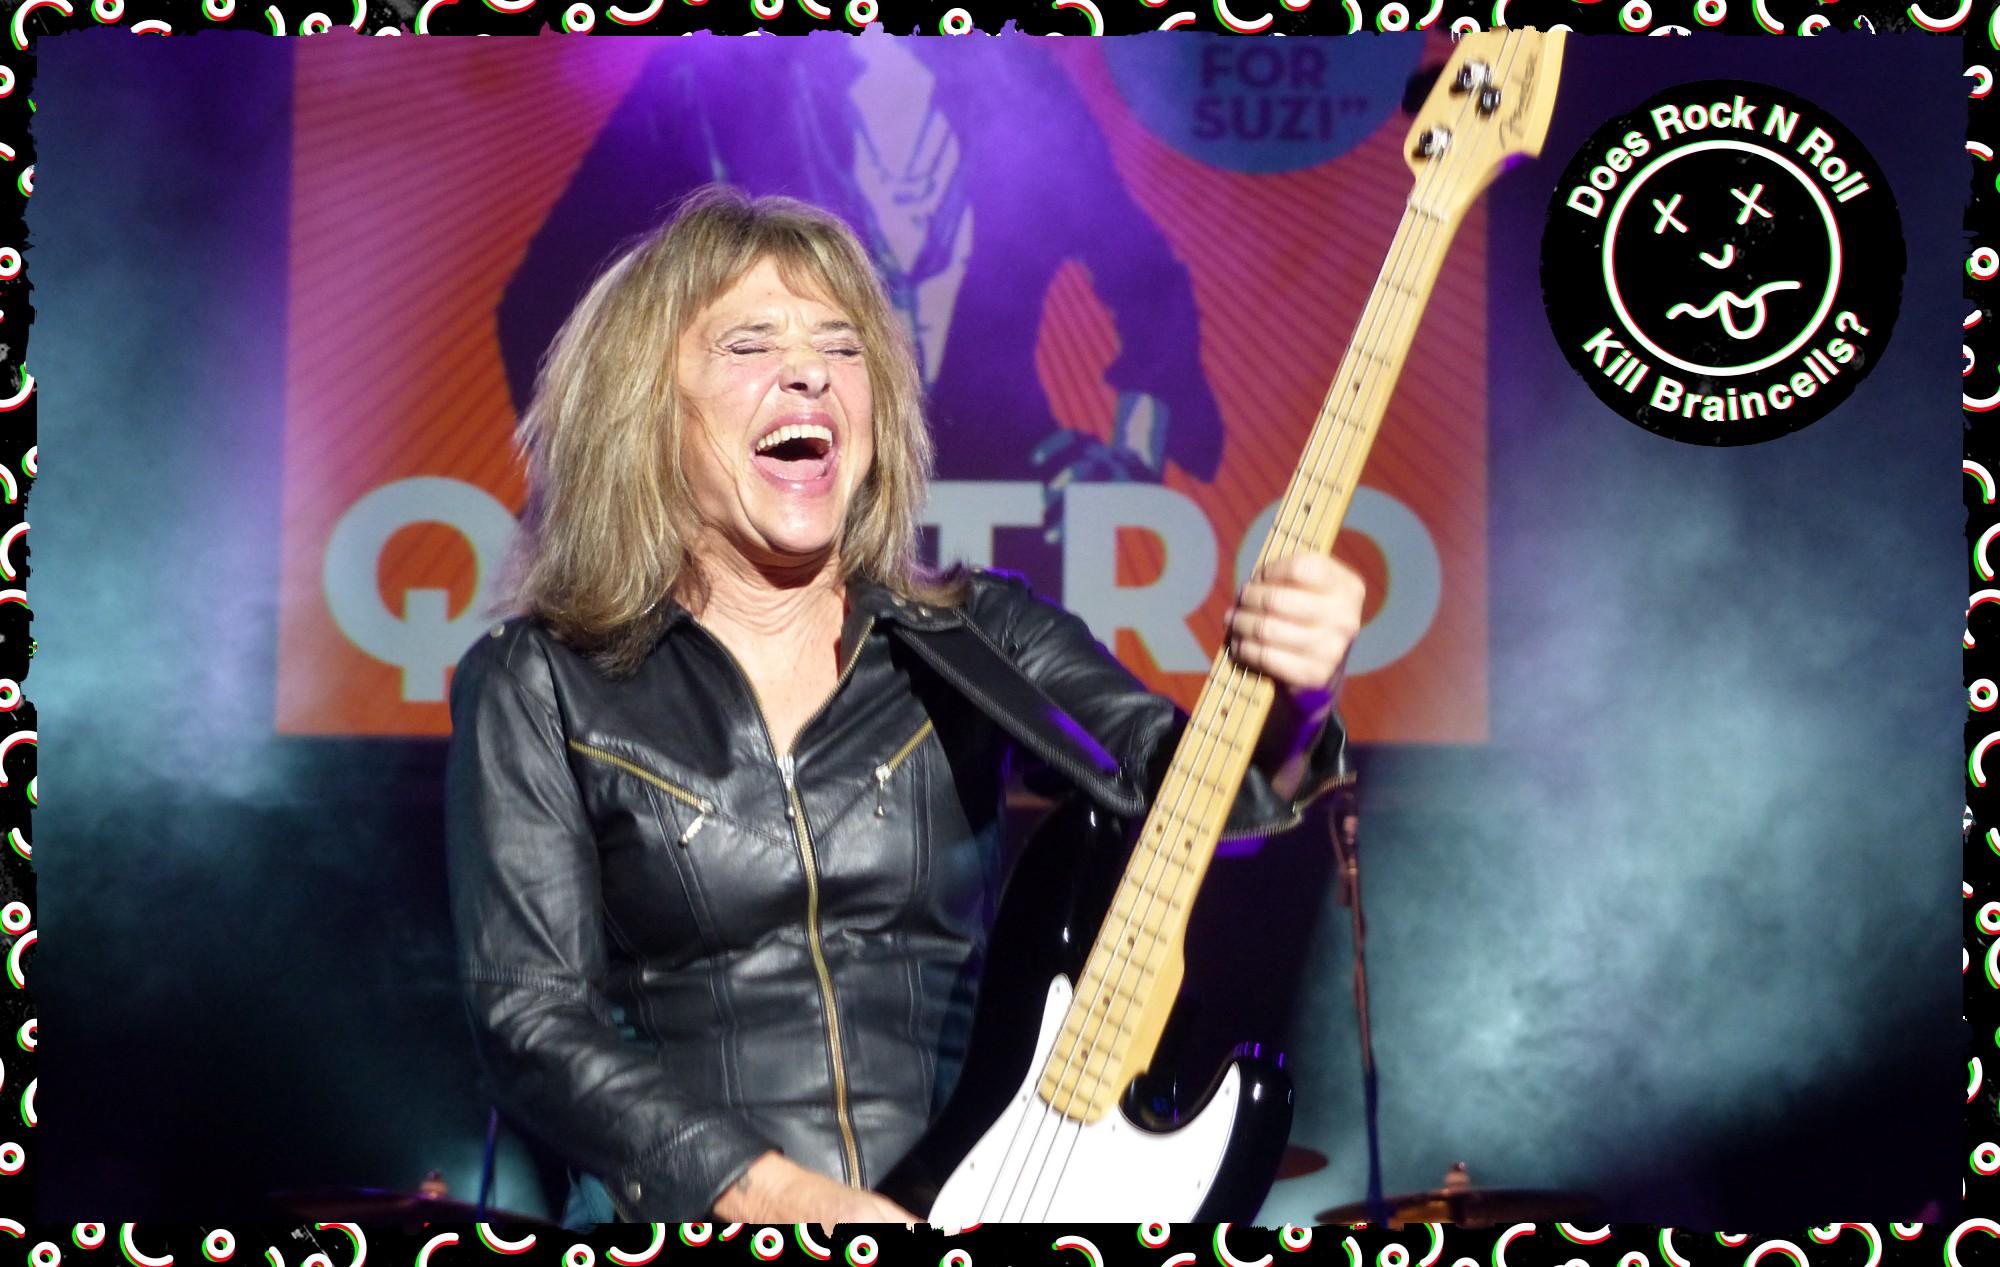 Suzi Quatro Does Rock 'N' Roll Kill Braincells?! - NME interview